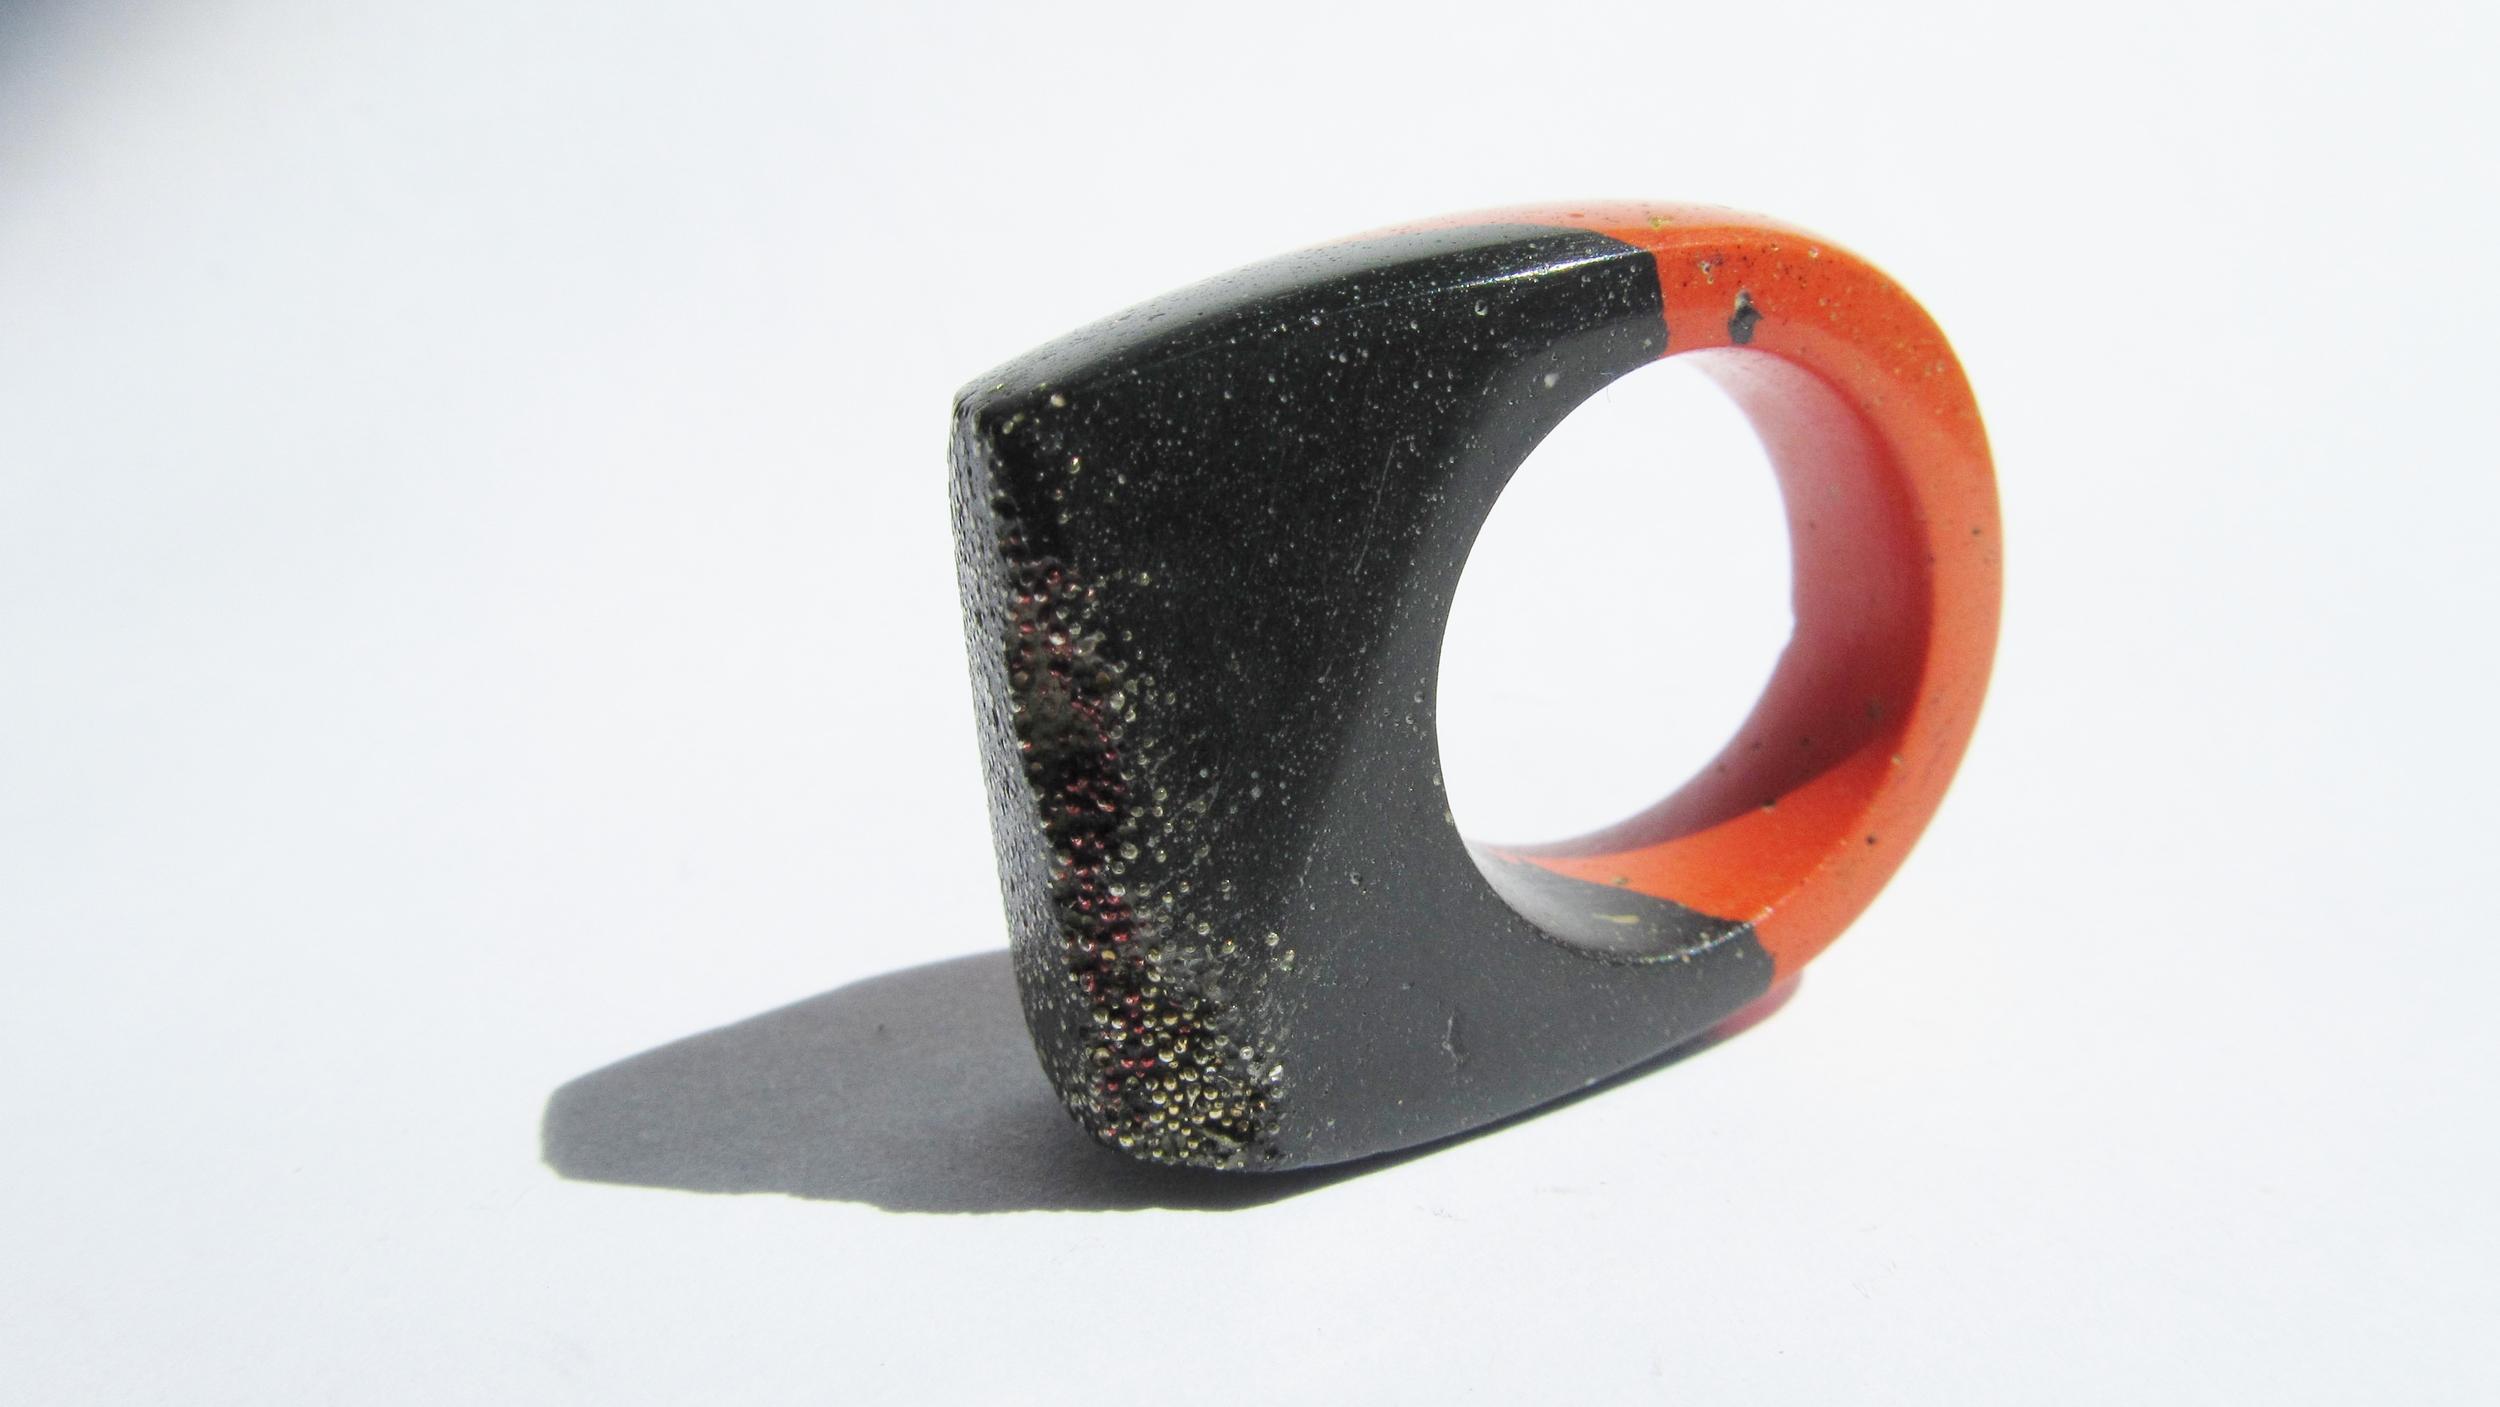 jade mellor hewn ring black red caviar gold caviar P 5.JPG